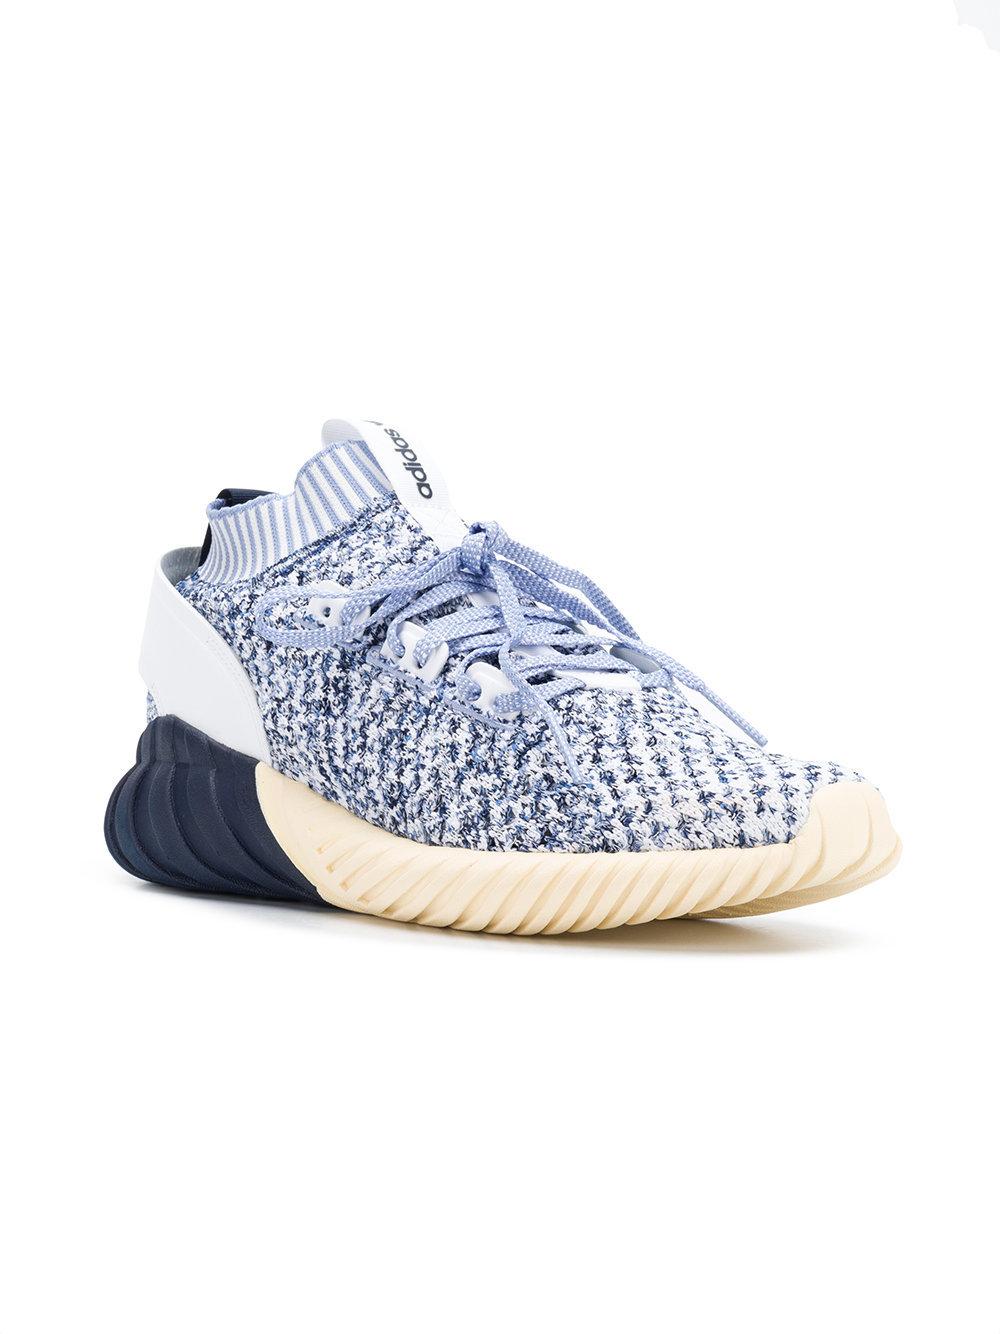 5c2bbcfc0c82 ... adidas Originals Tubular Doom Sock Primeknit Sneakers